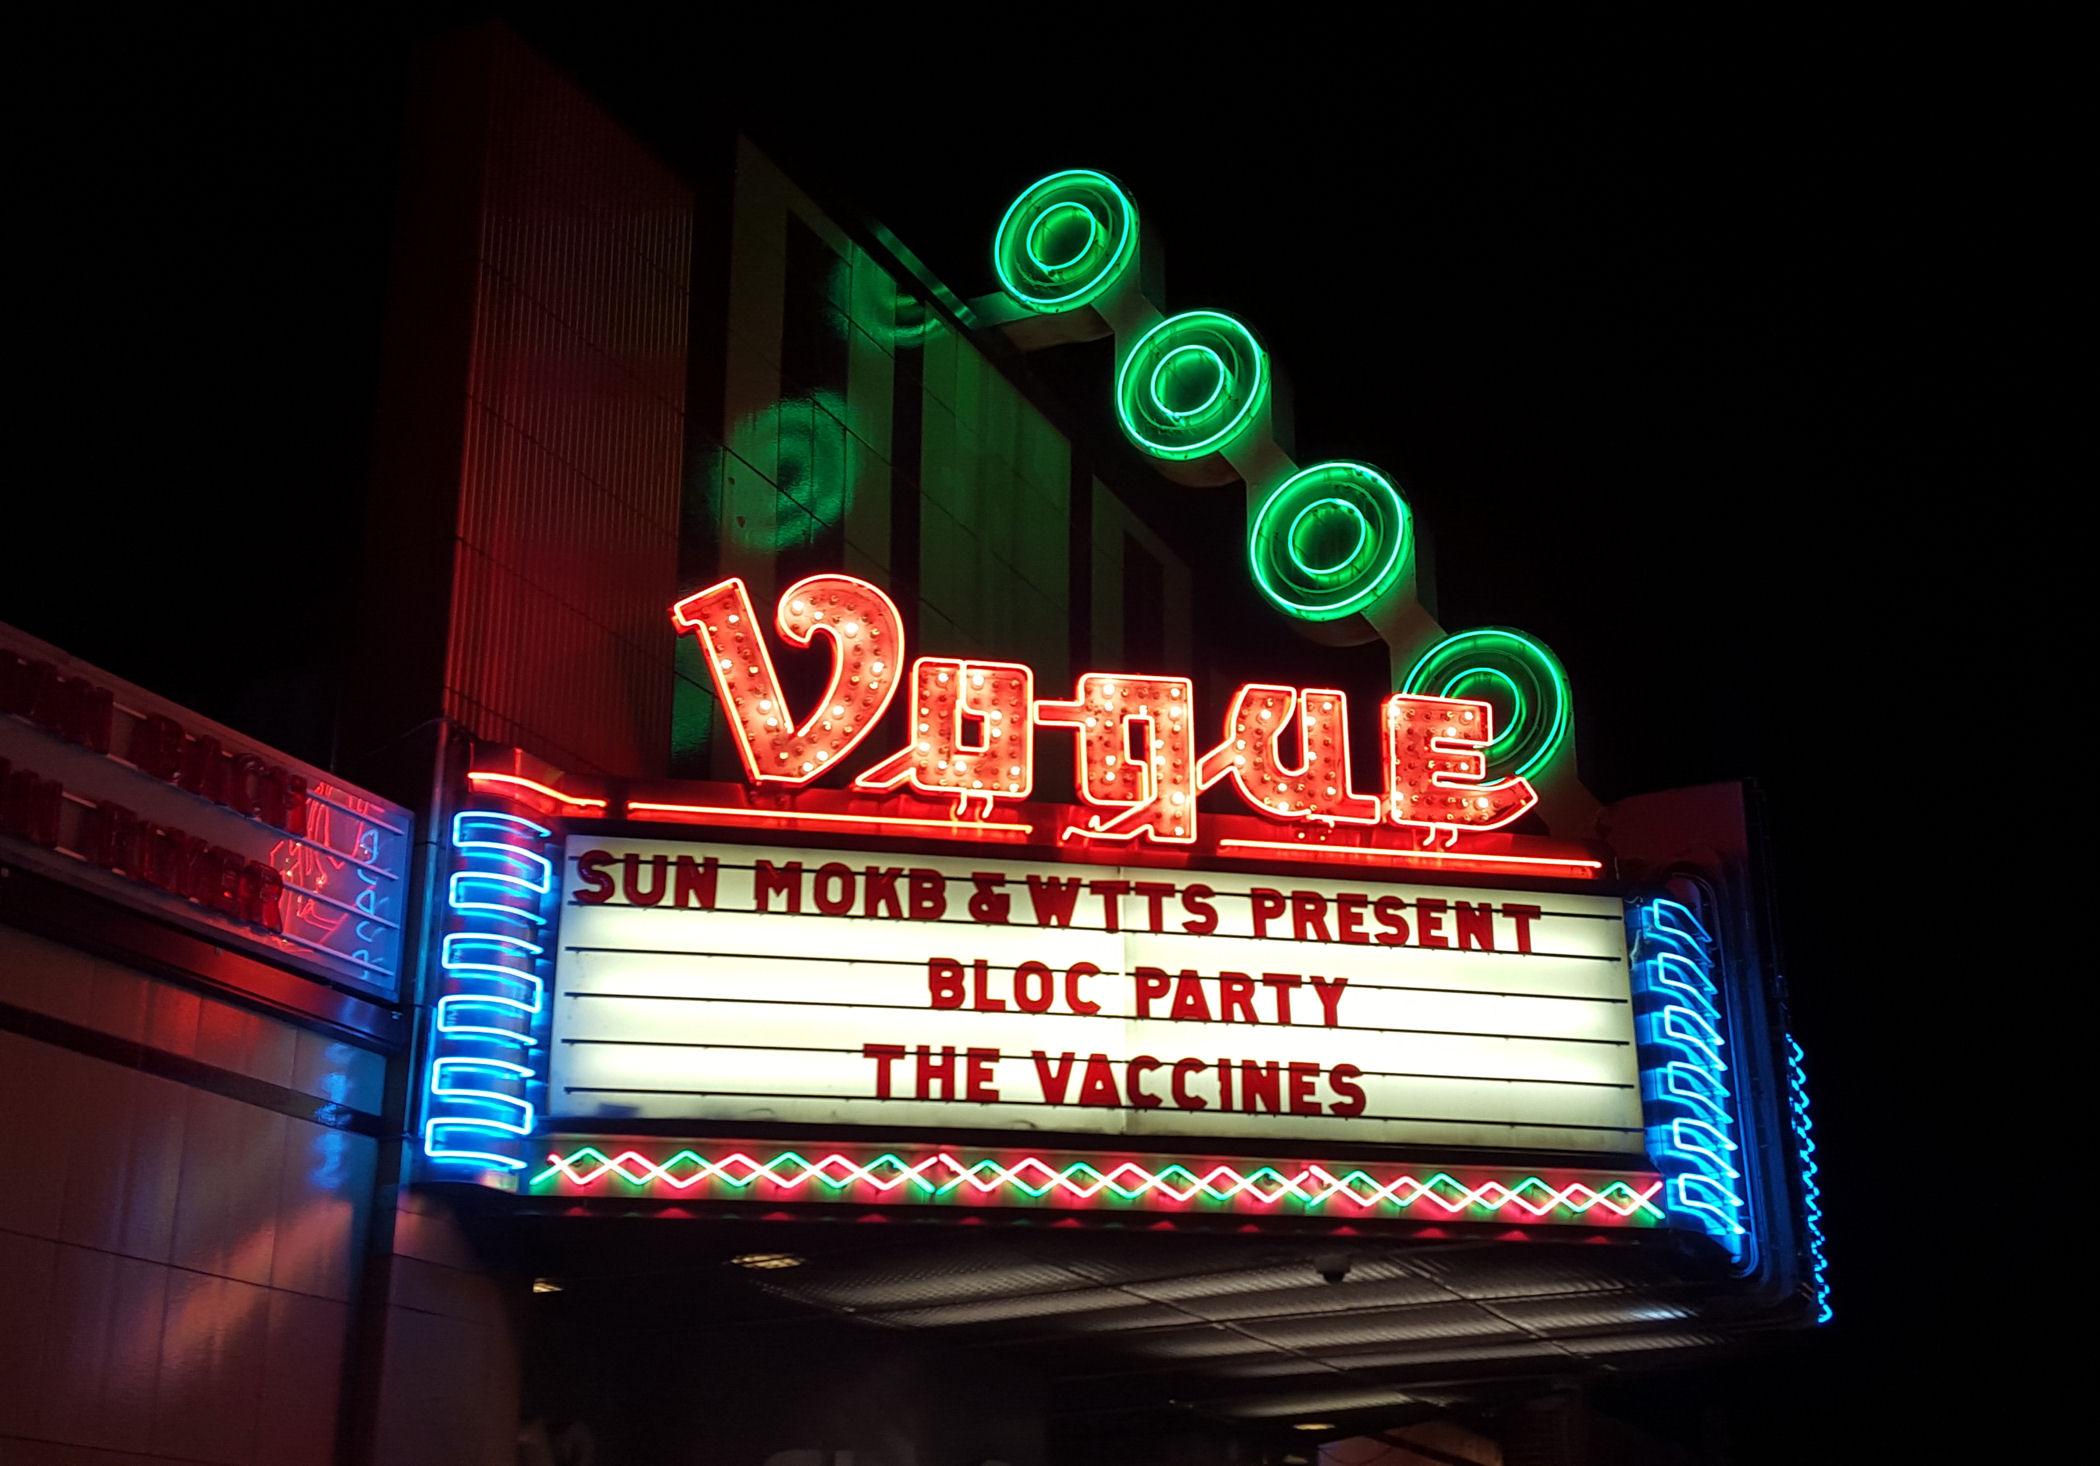 Bloc Party, The Vaccines, Oscar: My British Alt-Rock Party ...